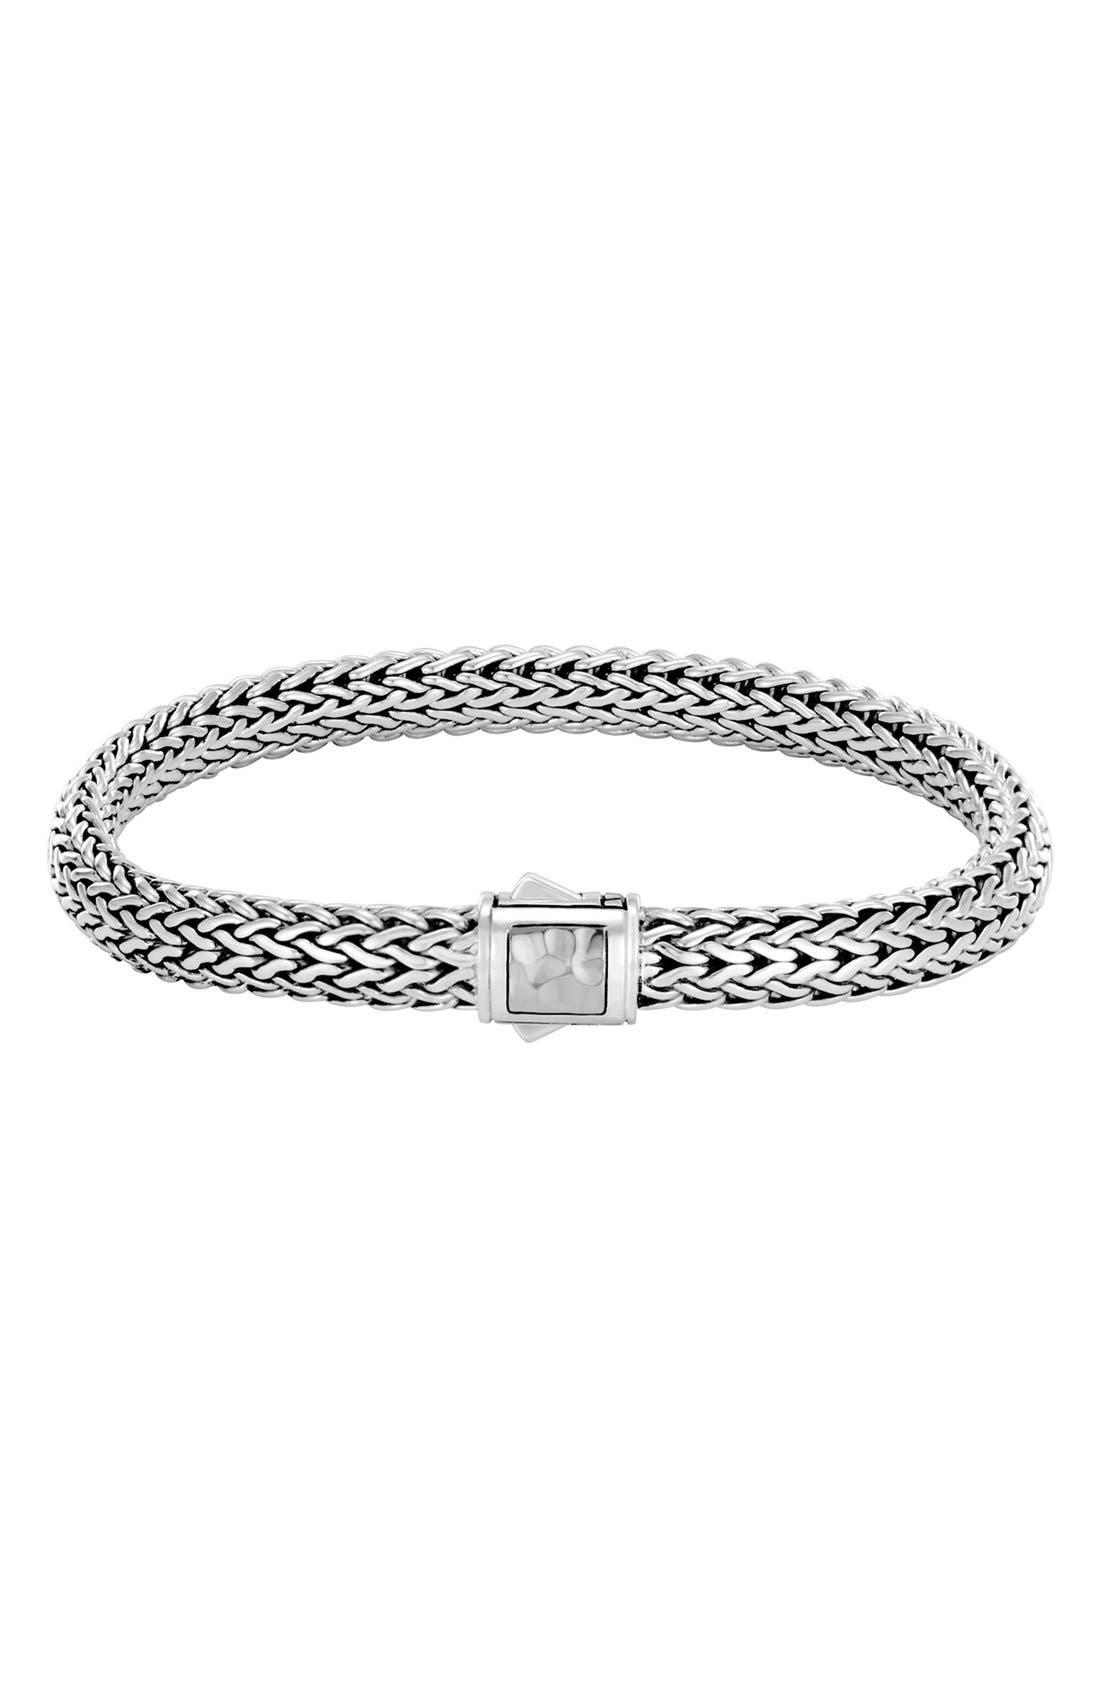 JOHN HARDY Classic Chain Medium Hammered Clasp Bracelet